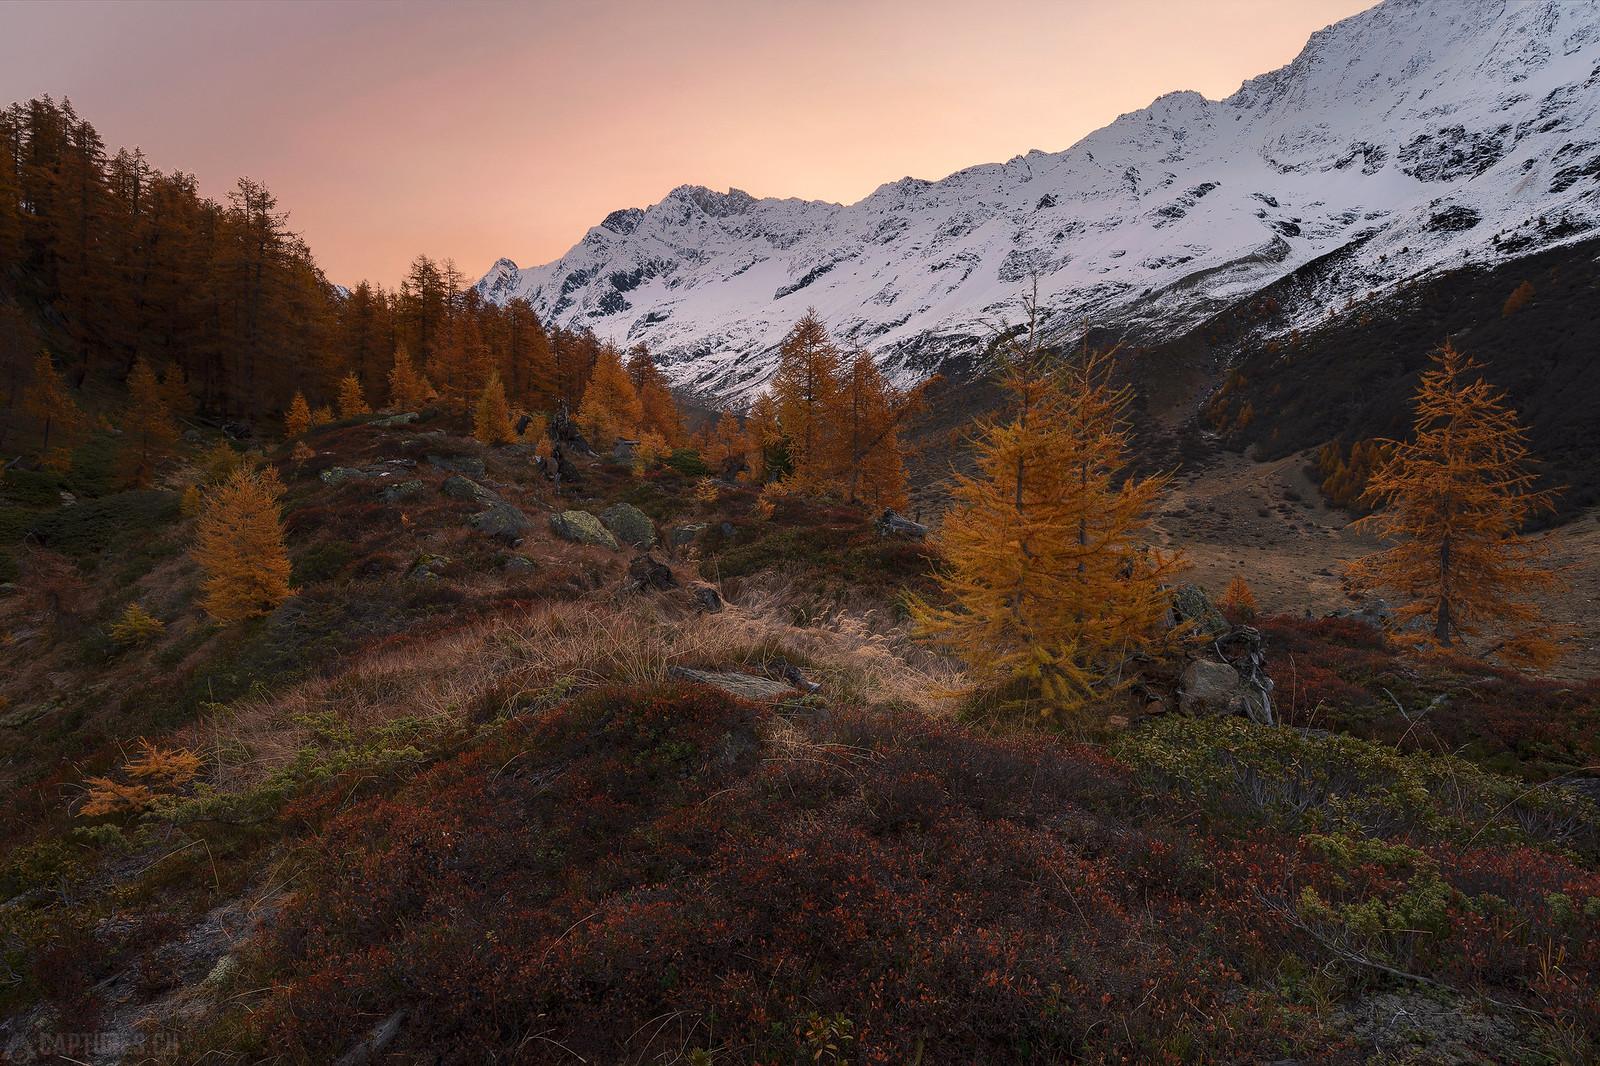 Sunrise colors - Lötschental